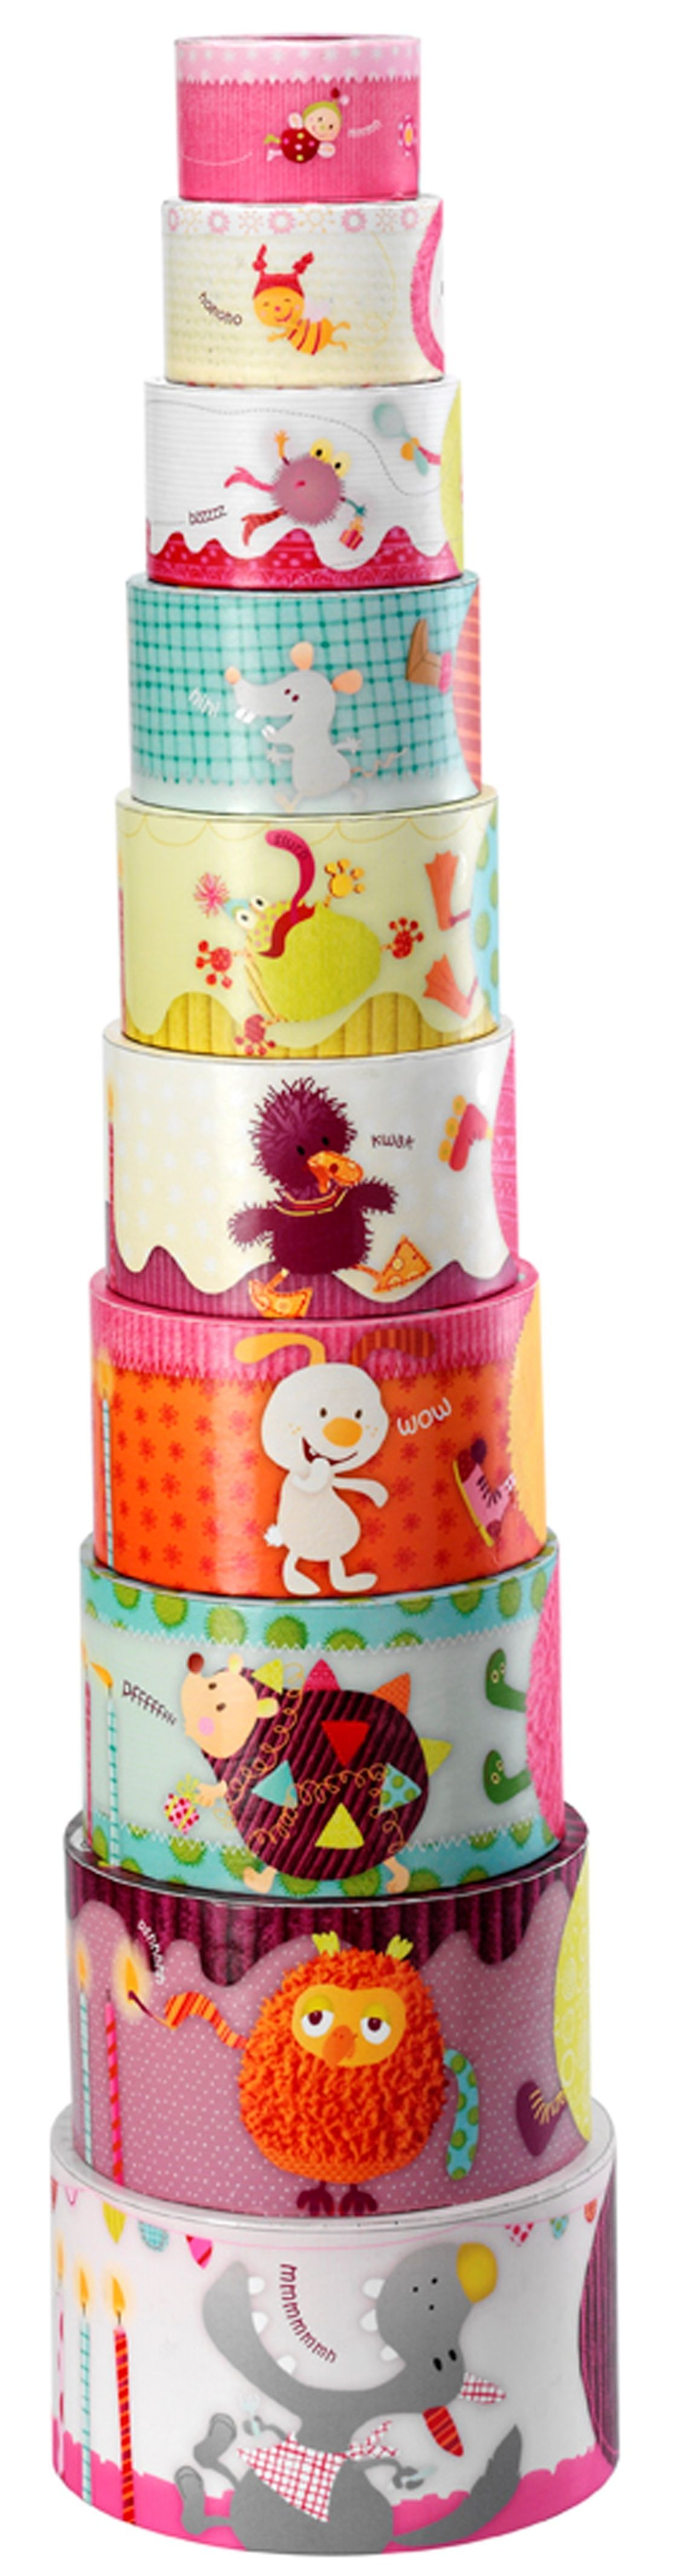 Pyramide Cake Juliette Lilliputiens Bambinou